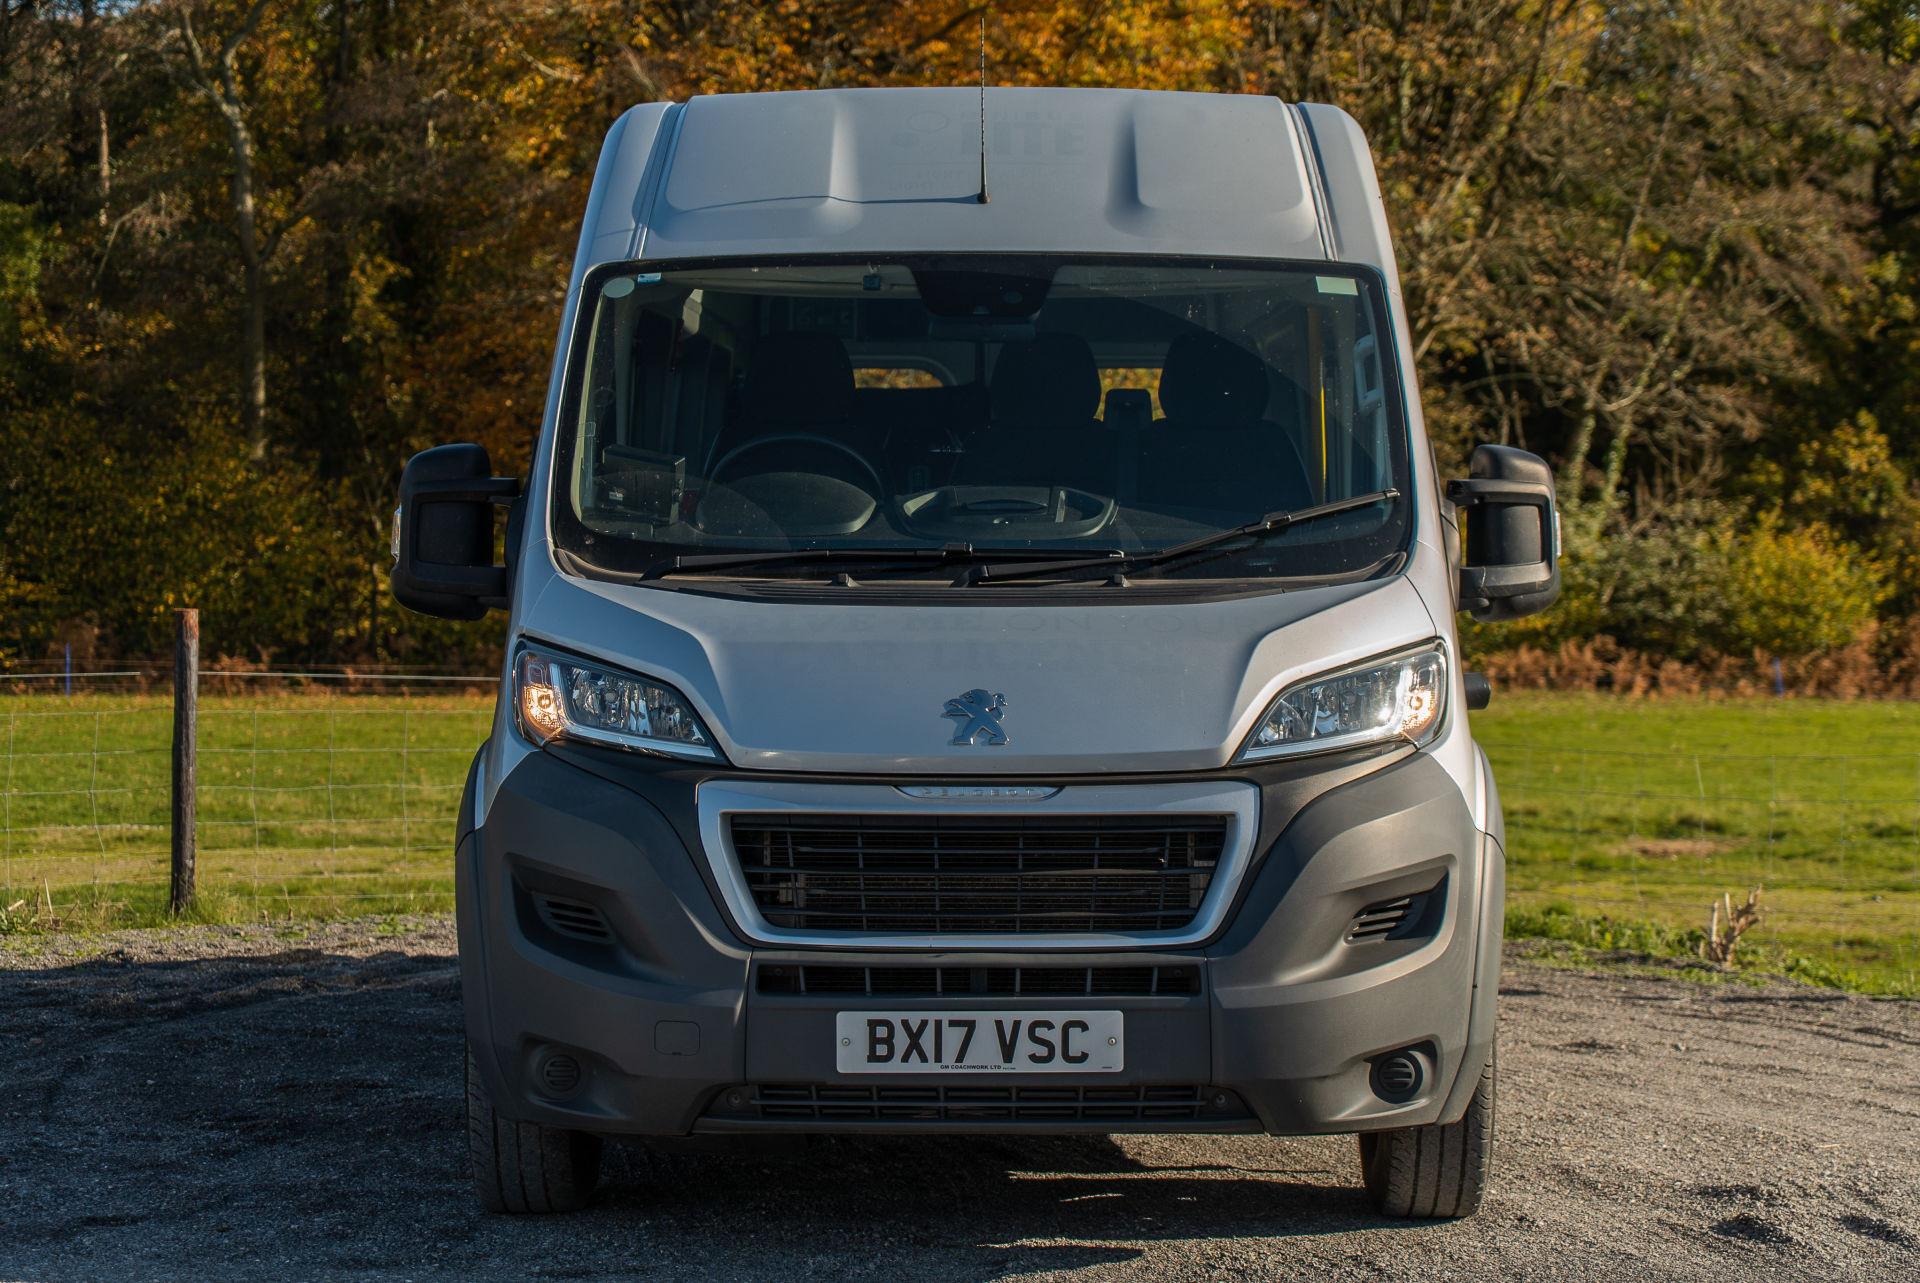 2017 Peugeot Boxer 17 Seater Accessible Minibus for Sale - Image 1